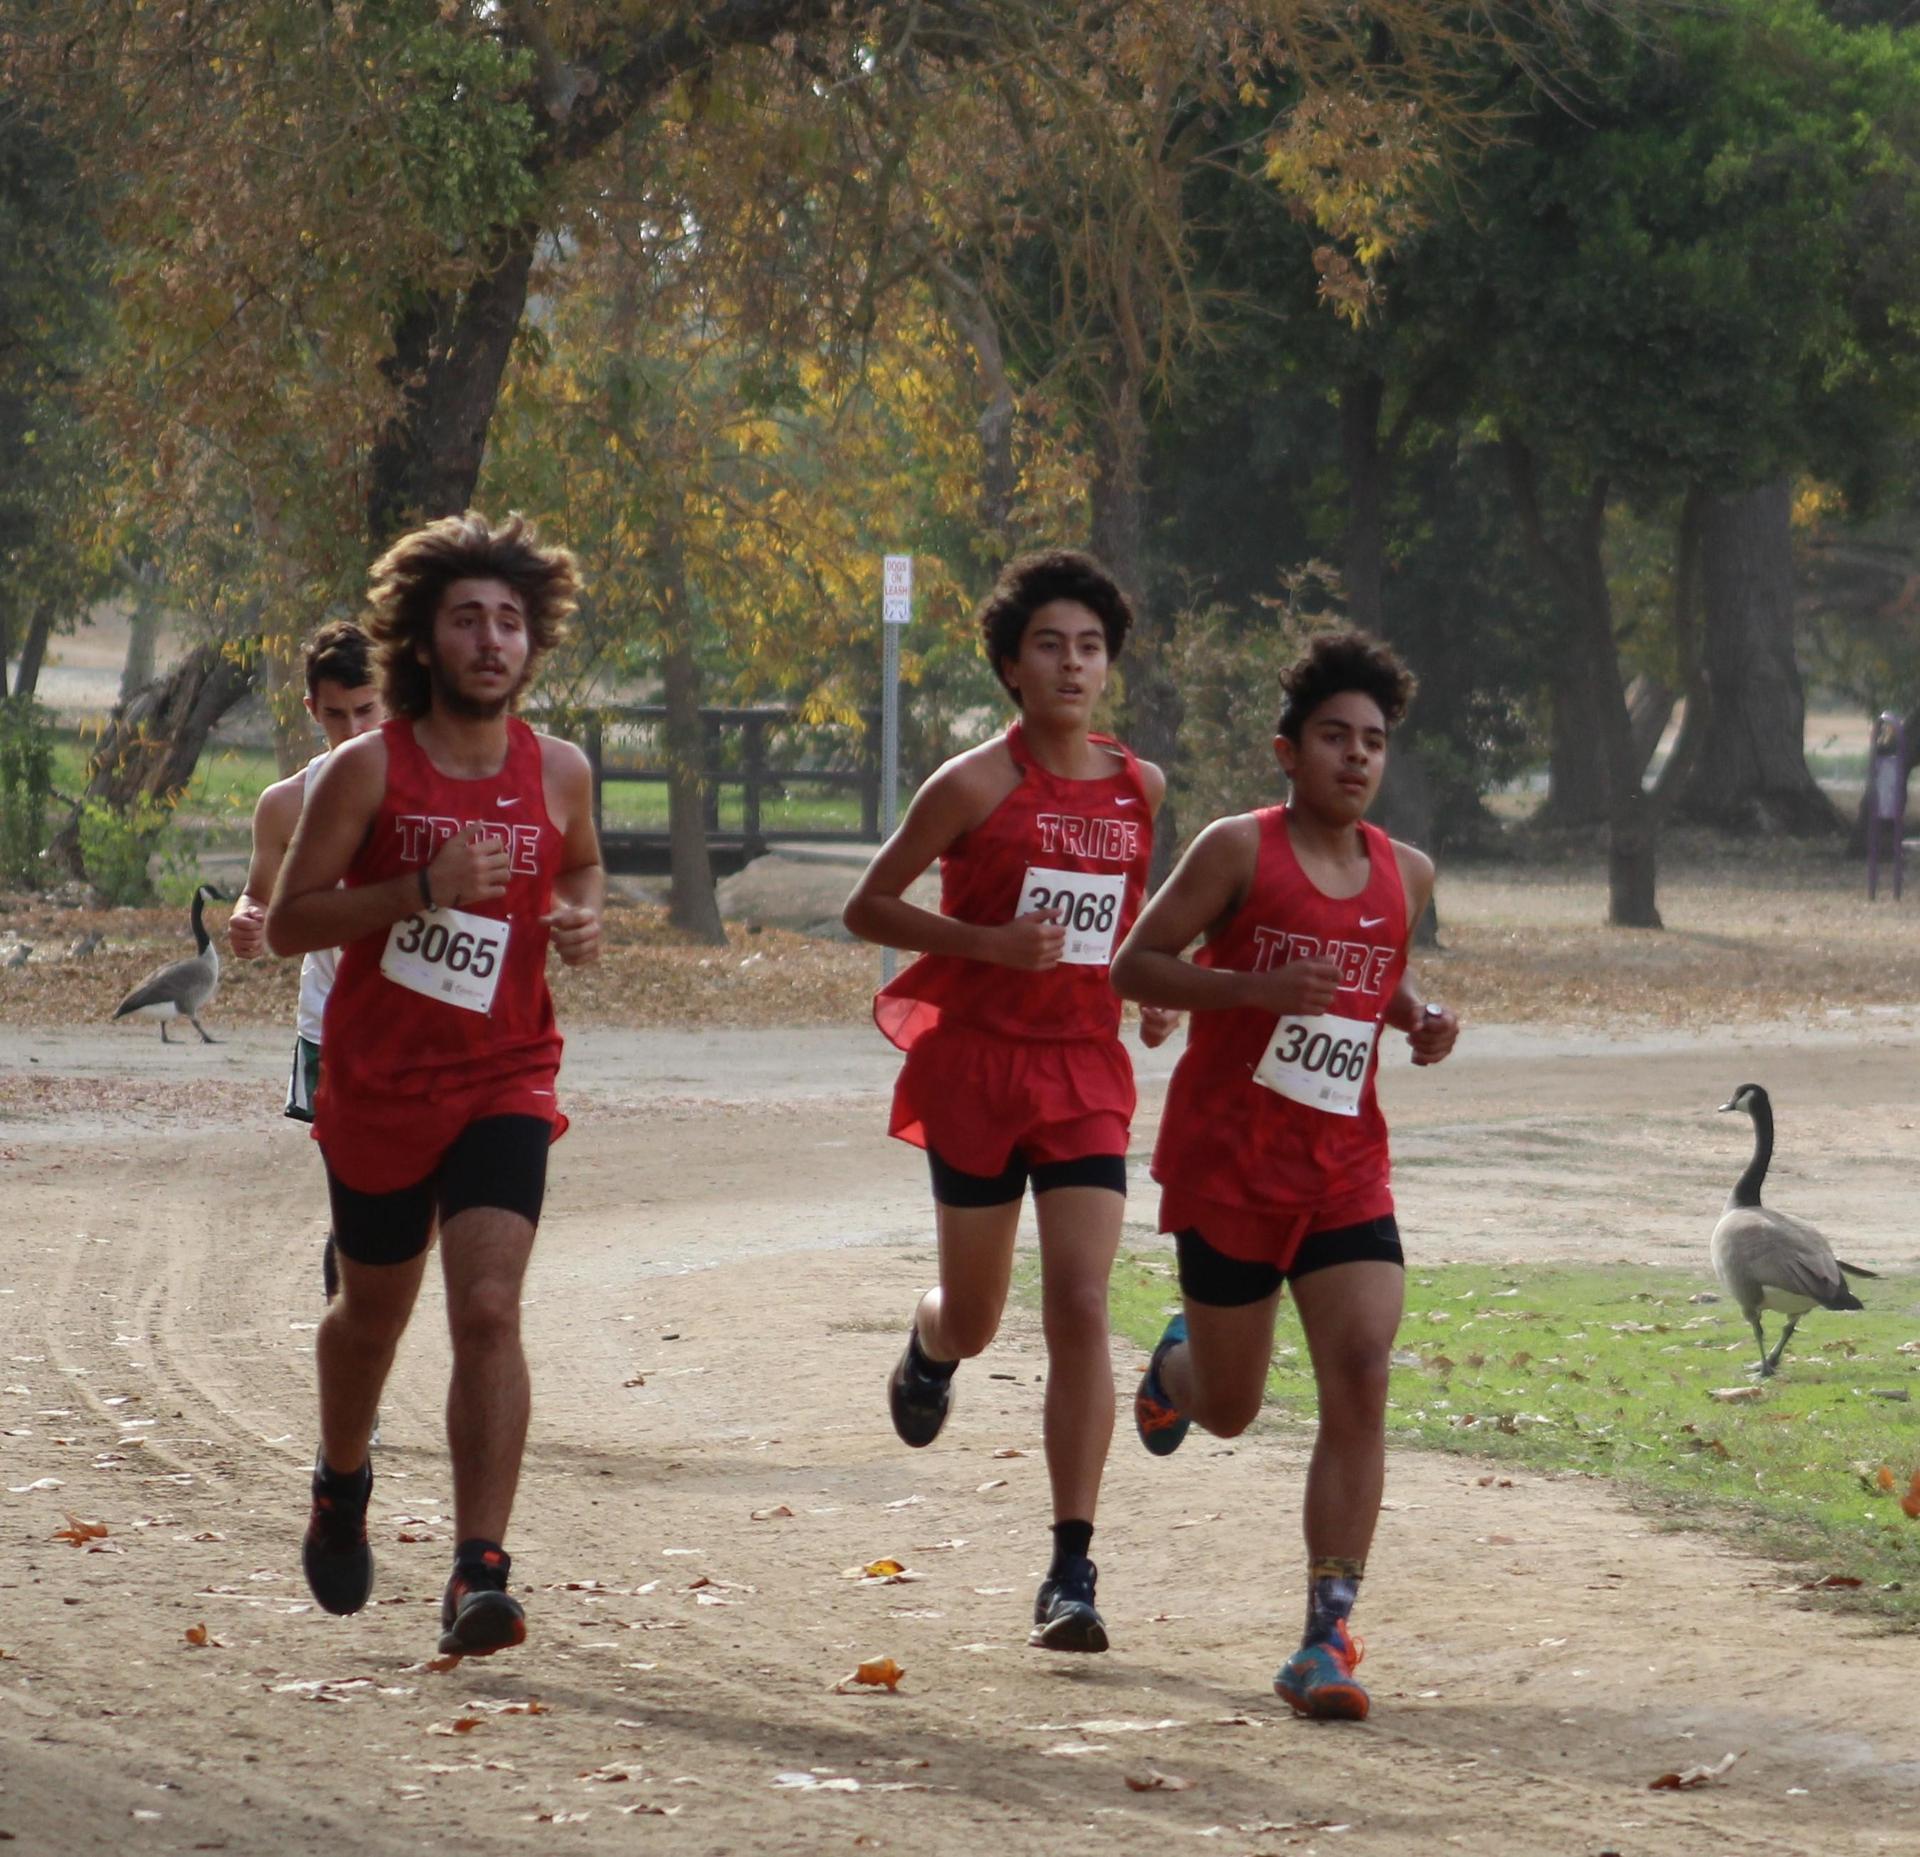 Antonio Brasil, Nicholas Lopez, Isaac Gonzales running